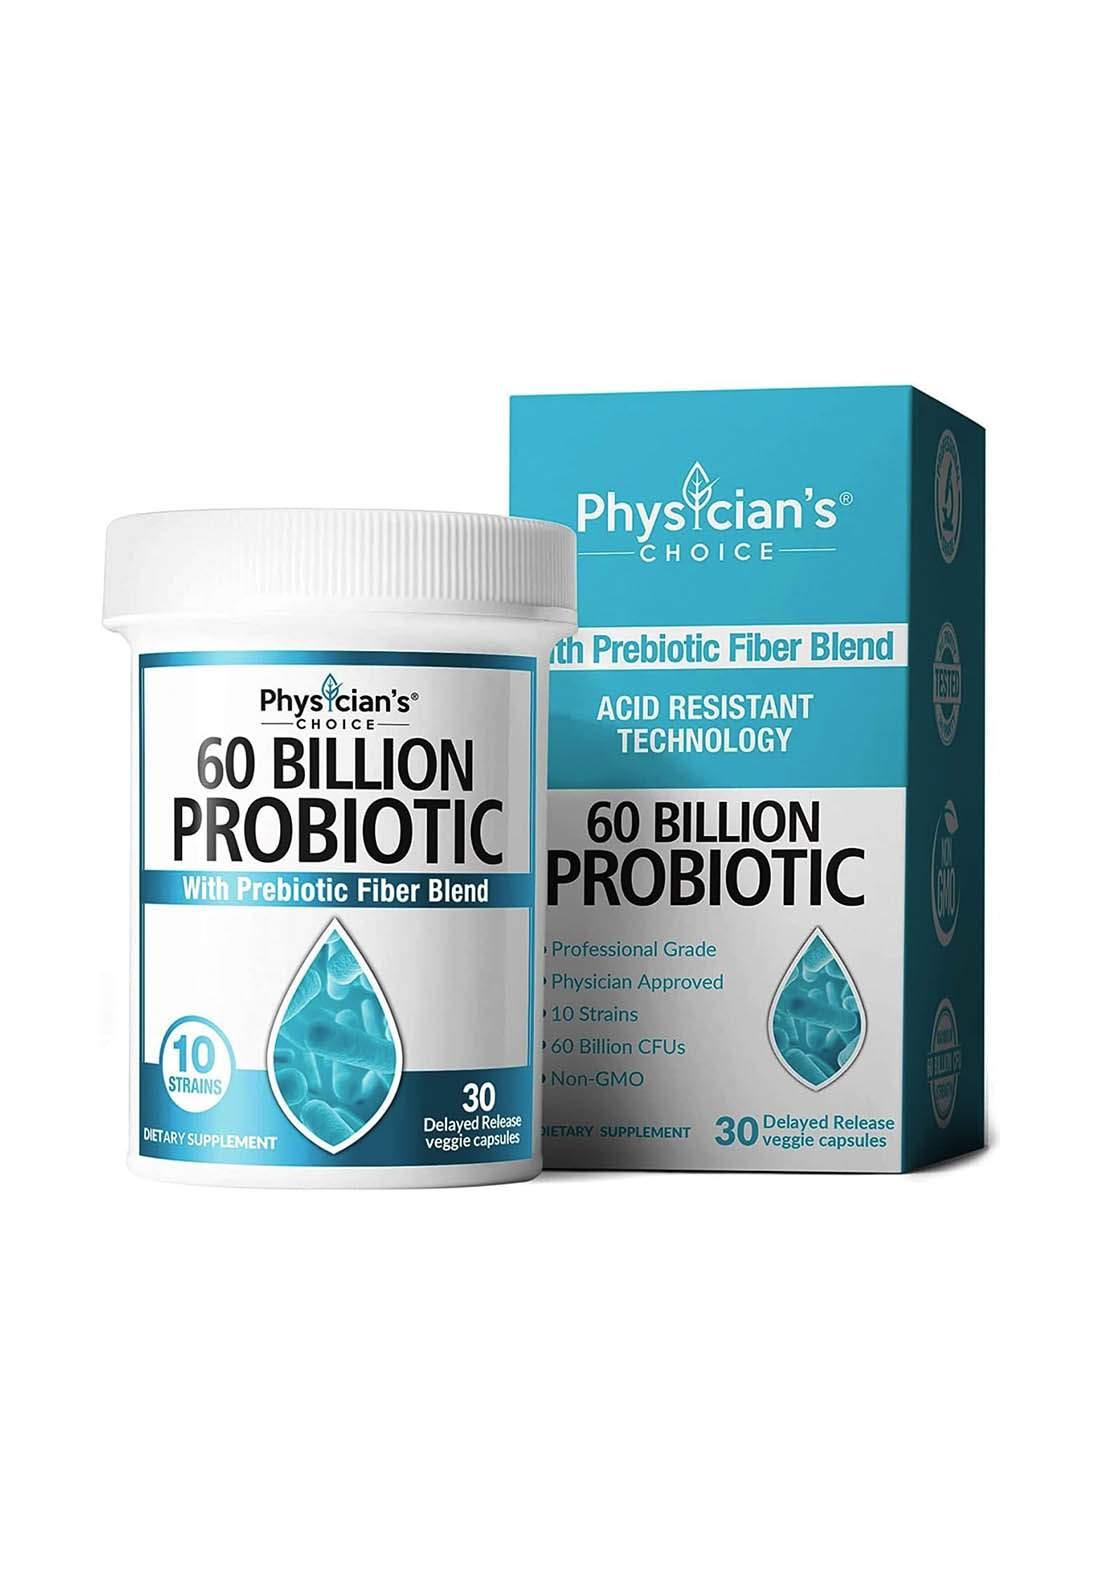 Physician's Choice Probiotic 60 Billion Gfu 30 Capsules مكمل غذائي 30 كبسولة